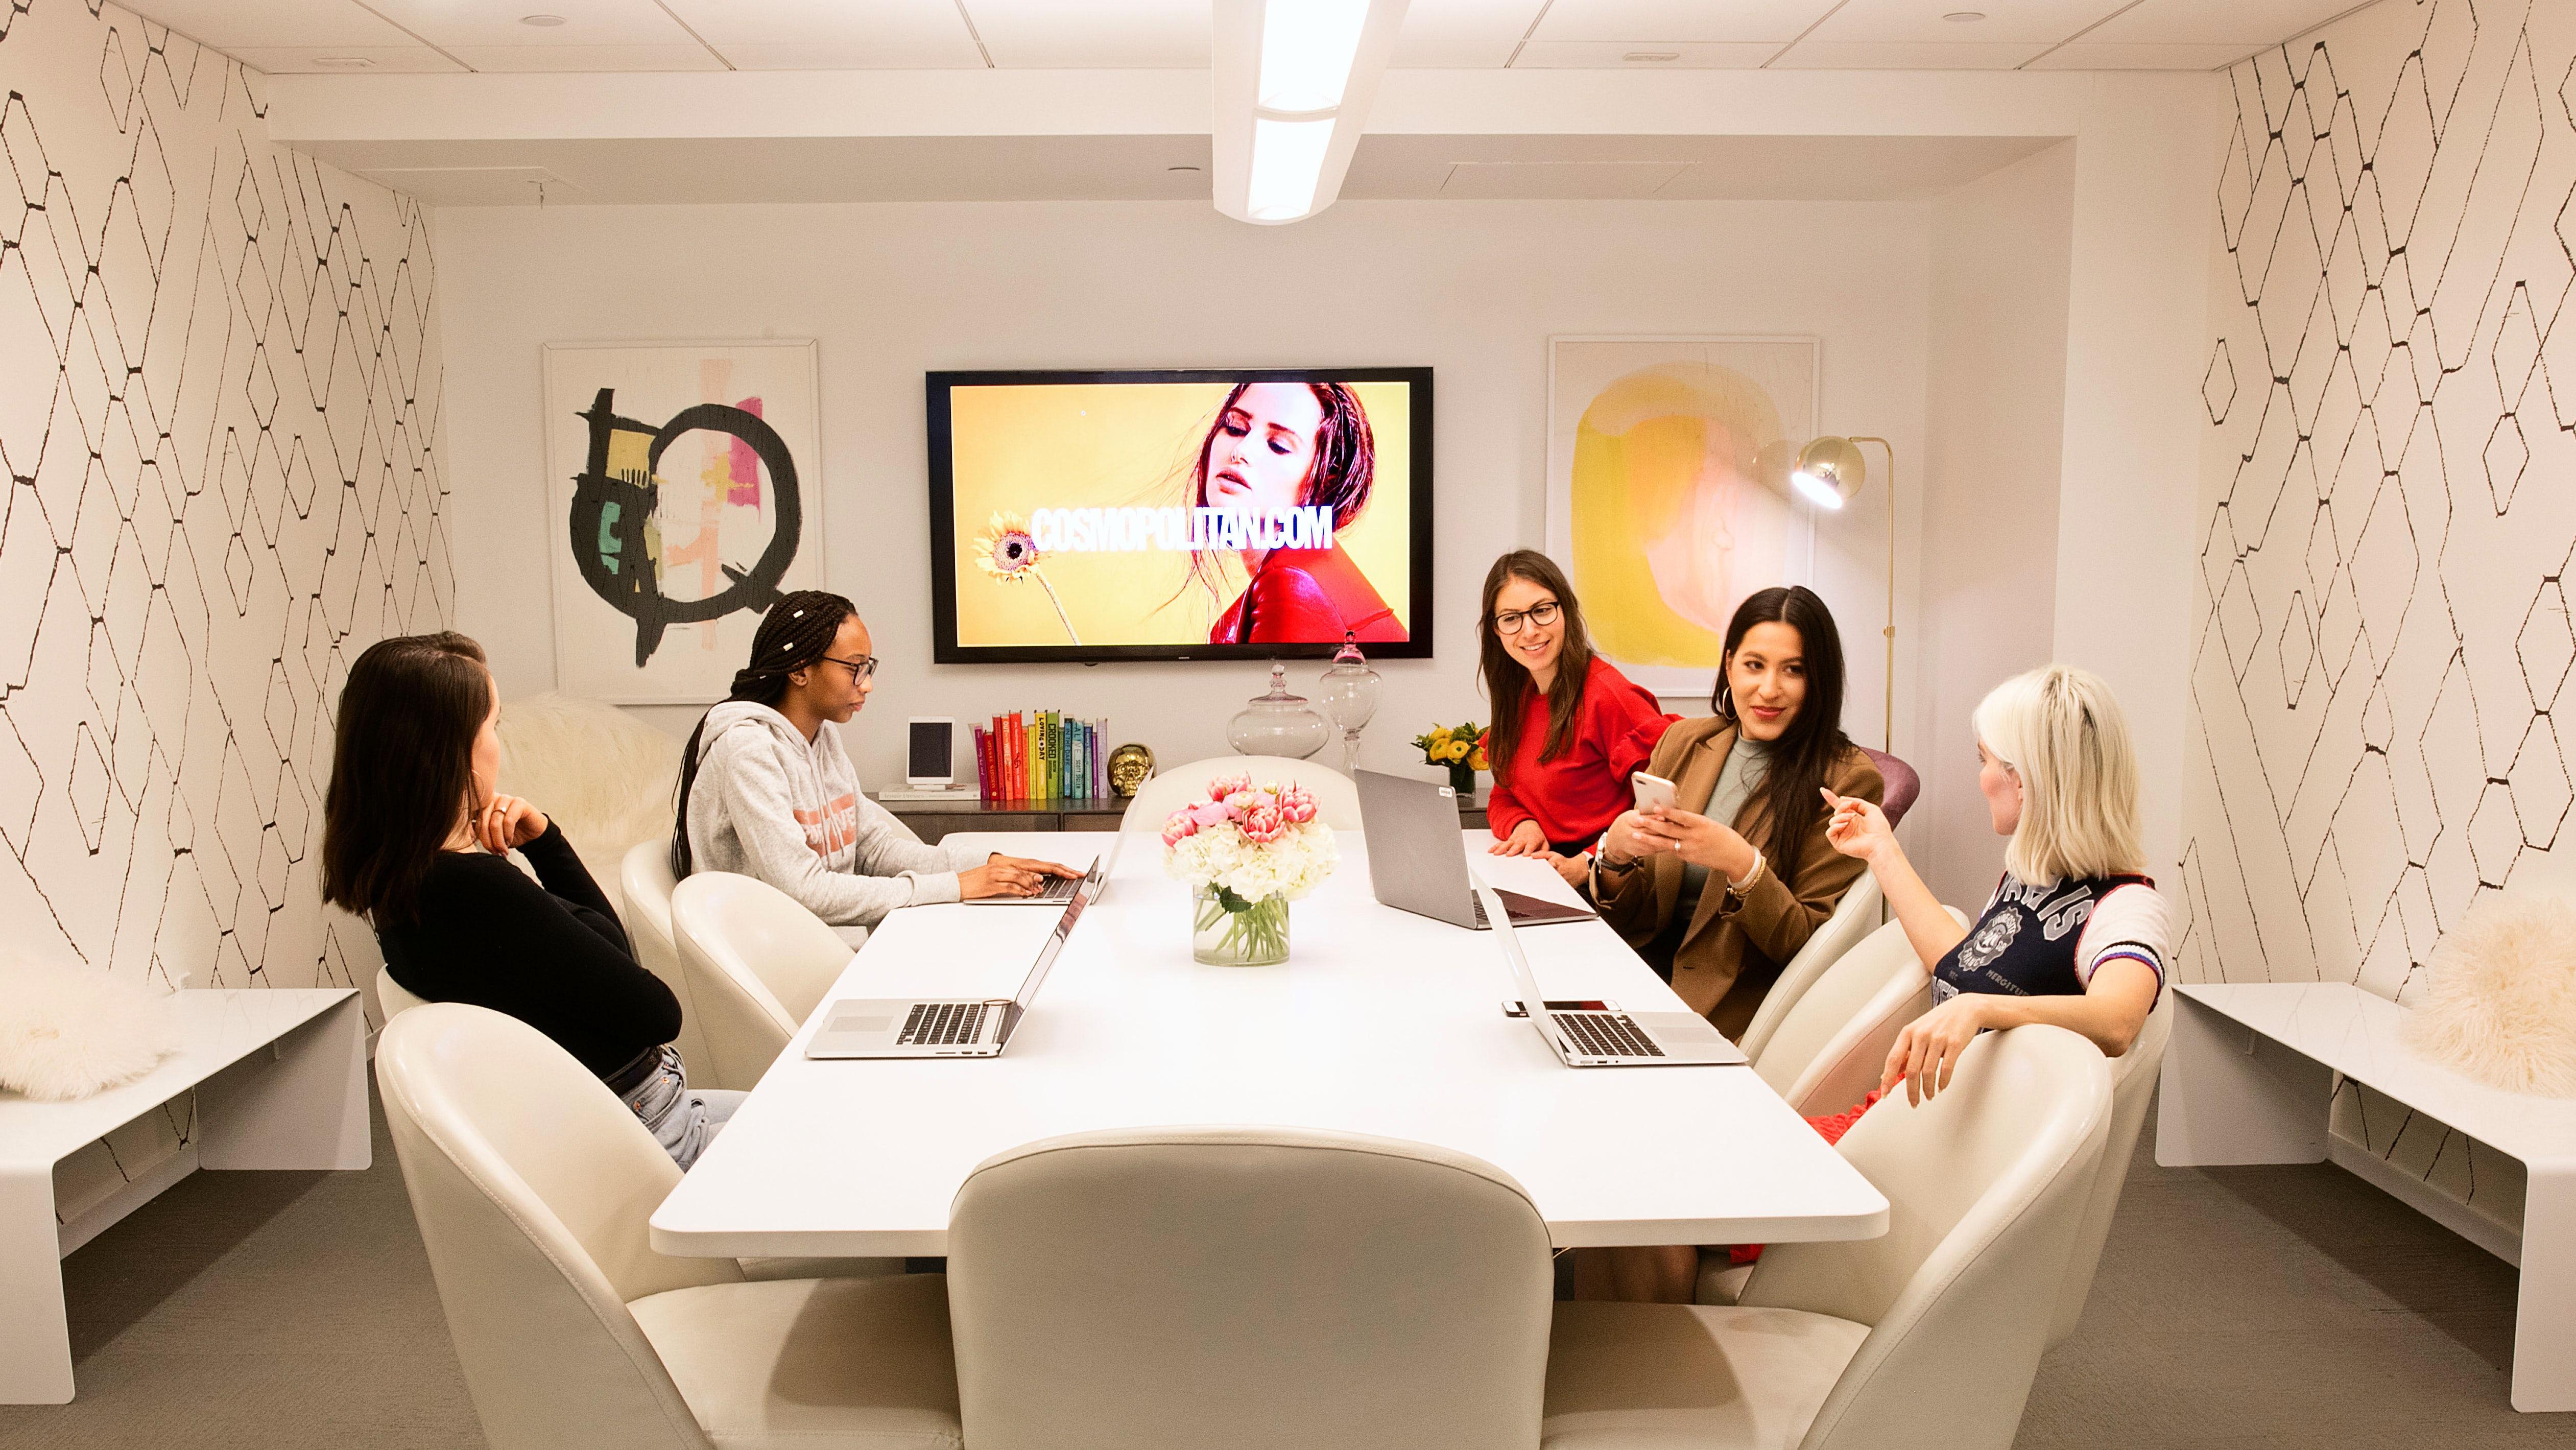 Cosmopolitan.com's conference room | Source: Courtesy